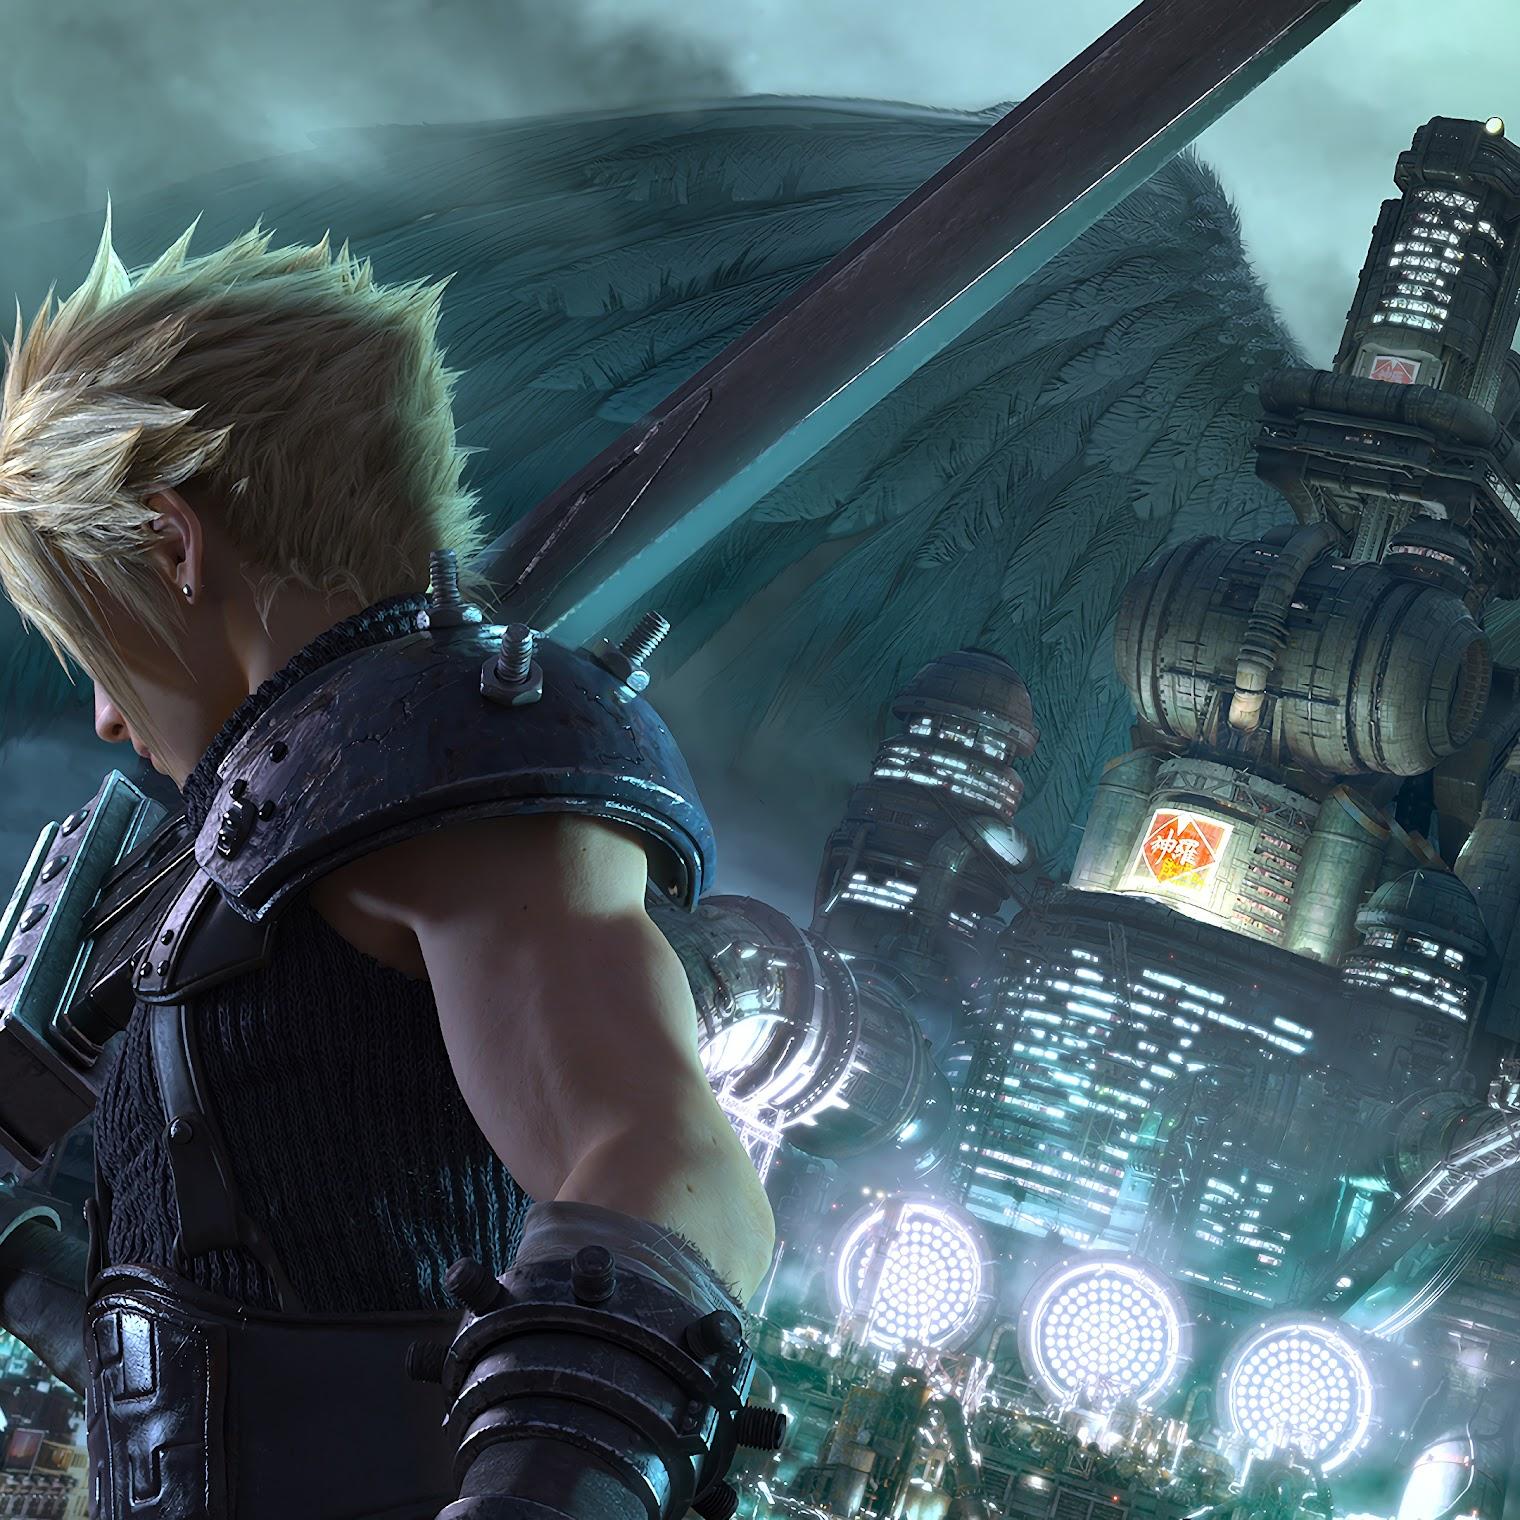 Final Fantasy 7 Remake, Cloud Strife, Sephiroth, 4K, #4